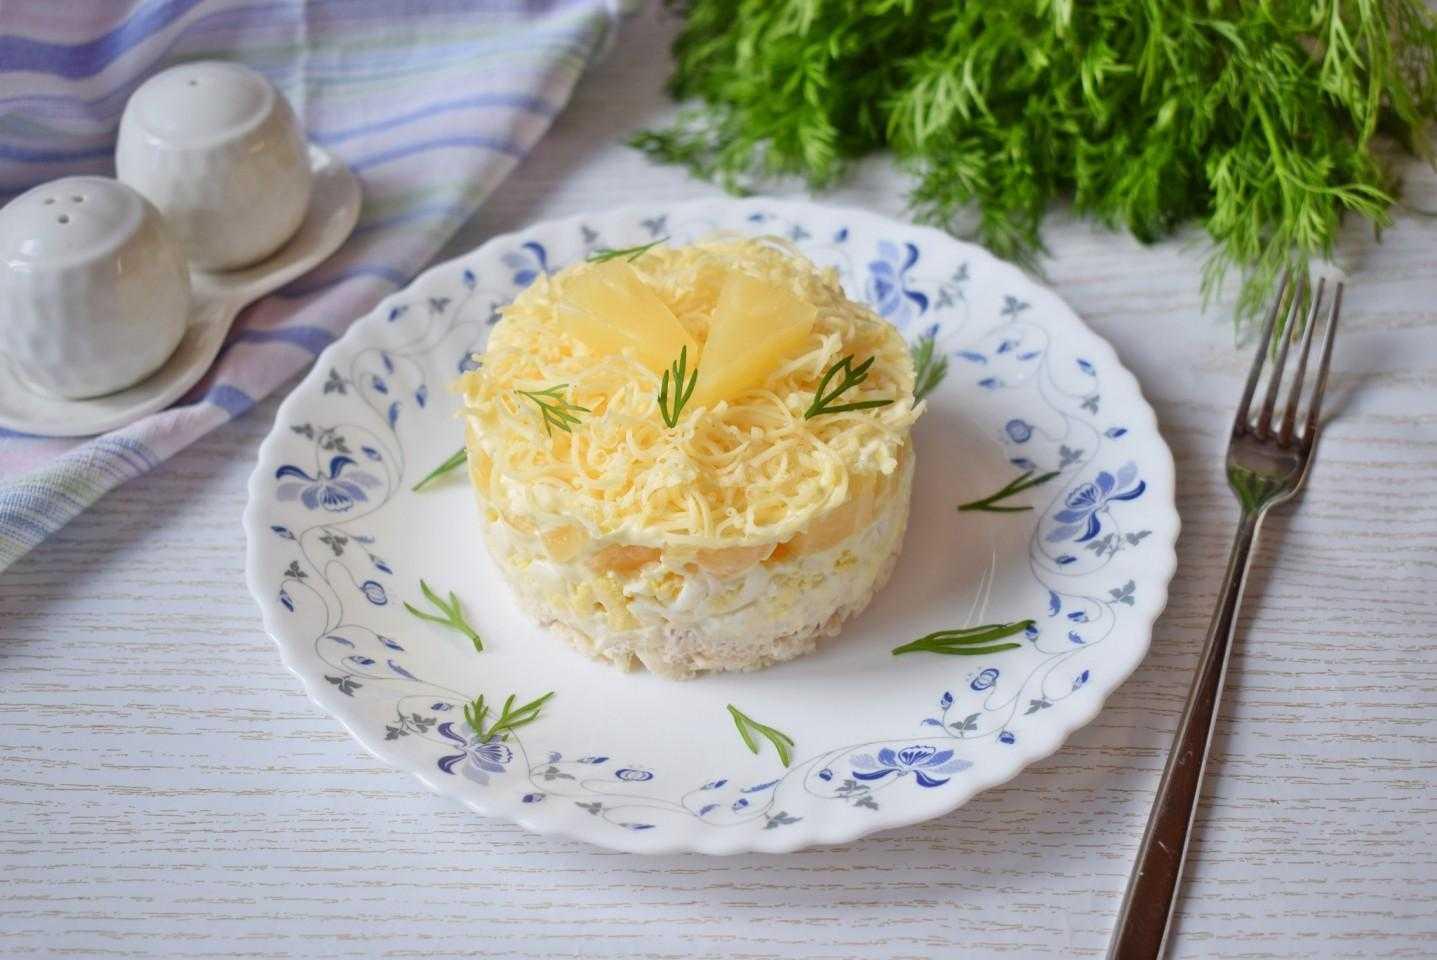 Салат викинг рецепт с ананасами и курицей и грибами магнит